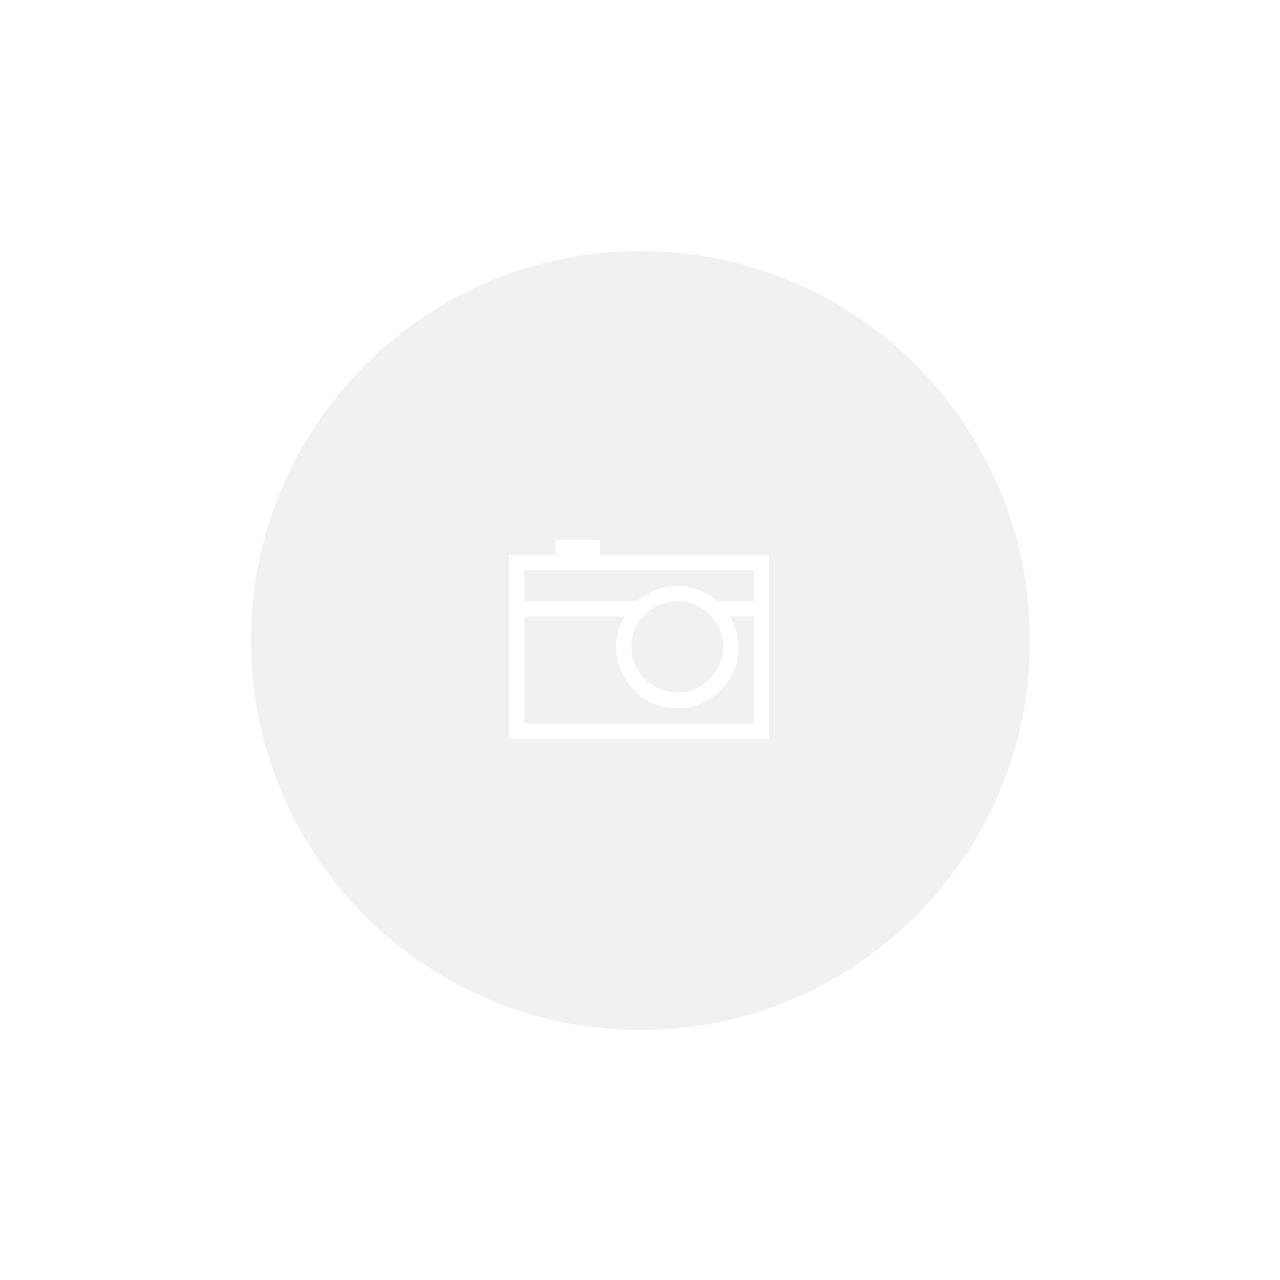 Caçarola Funda Inox 24Cm 5,90 Litros Trix Tramontina